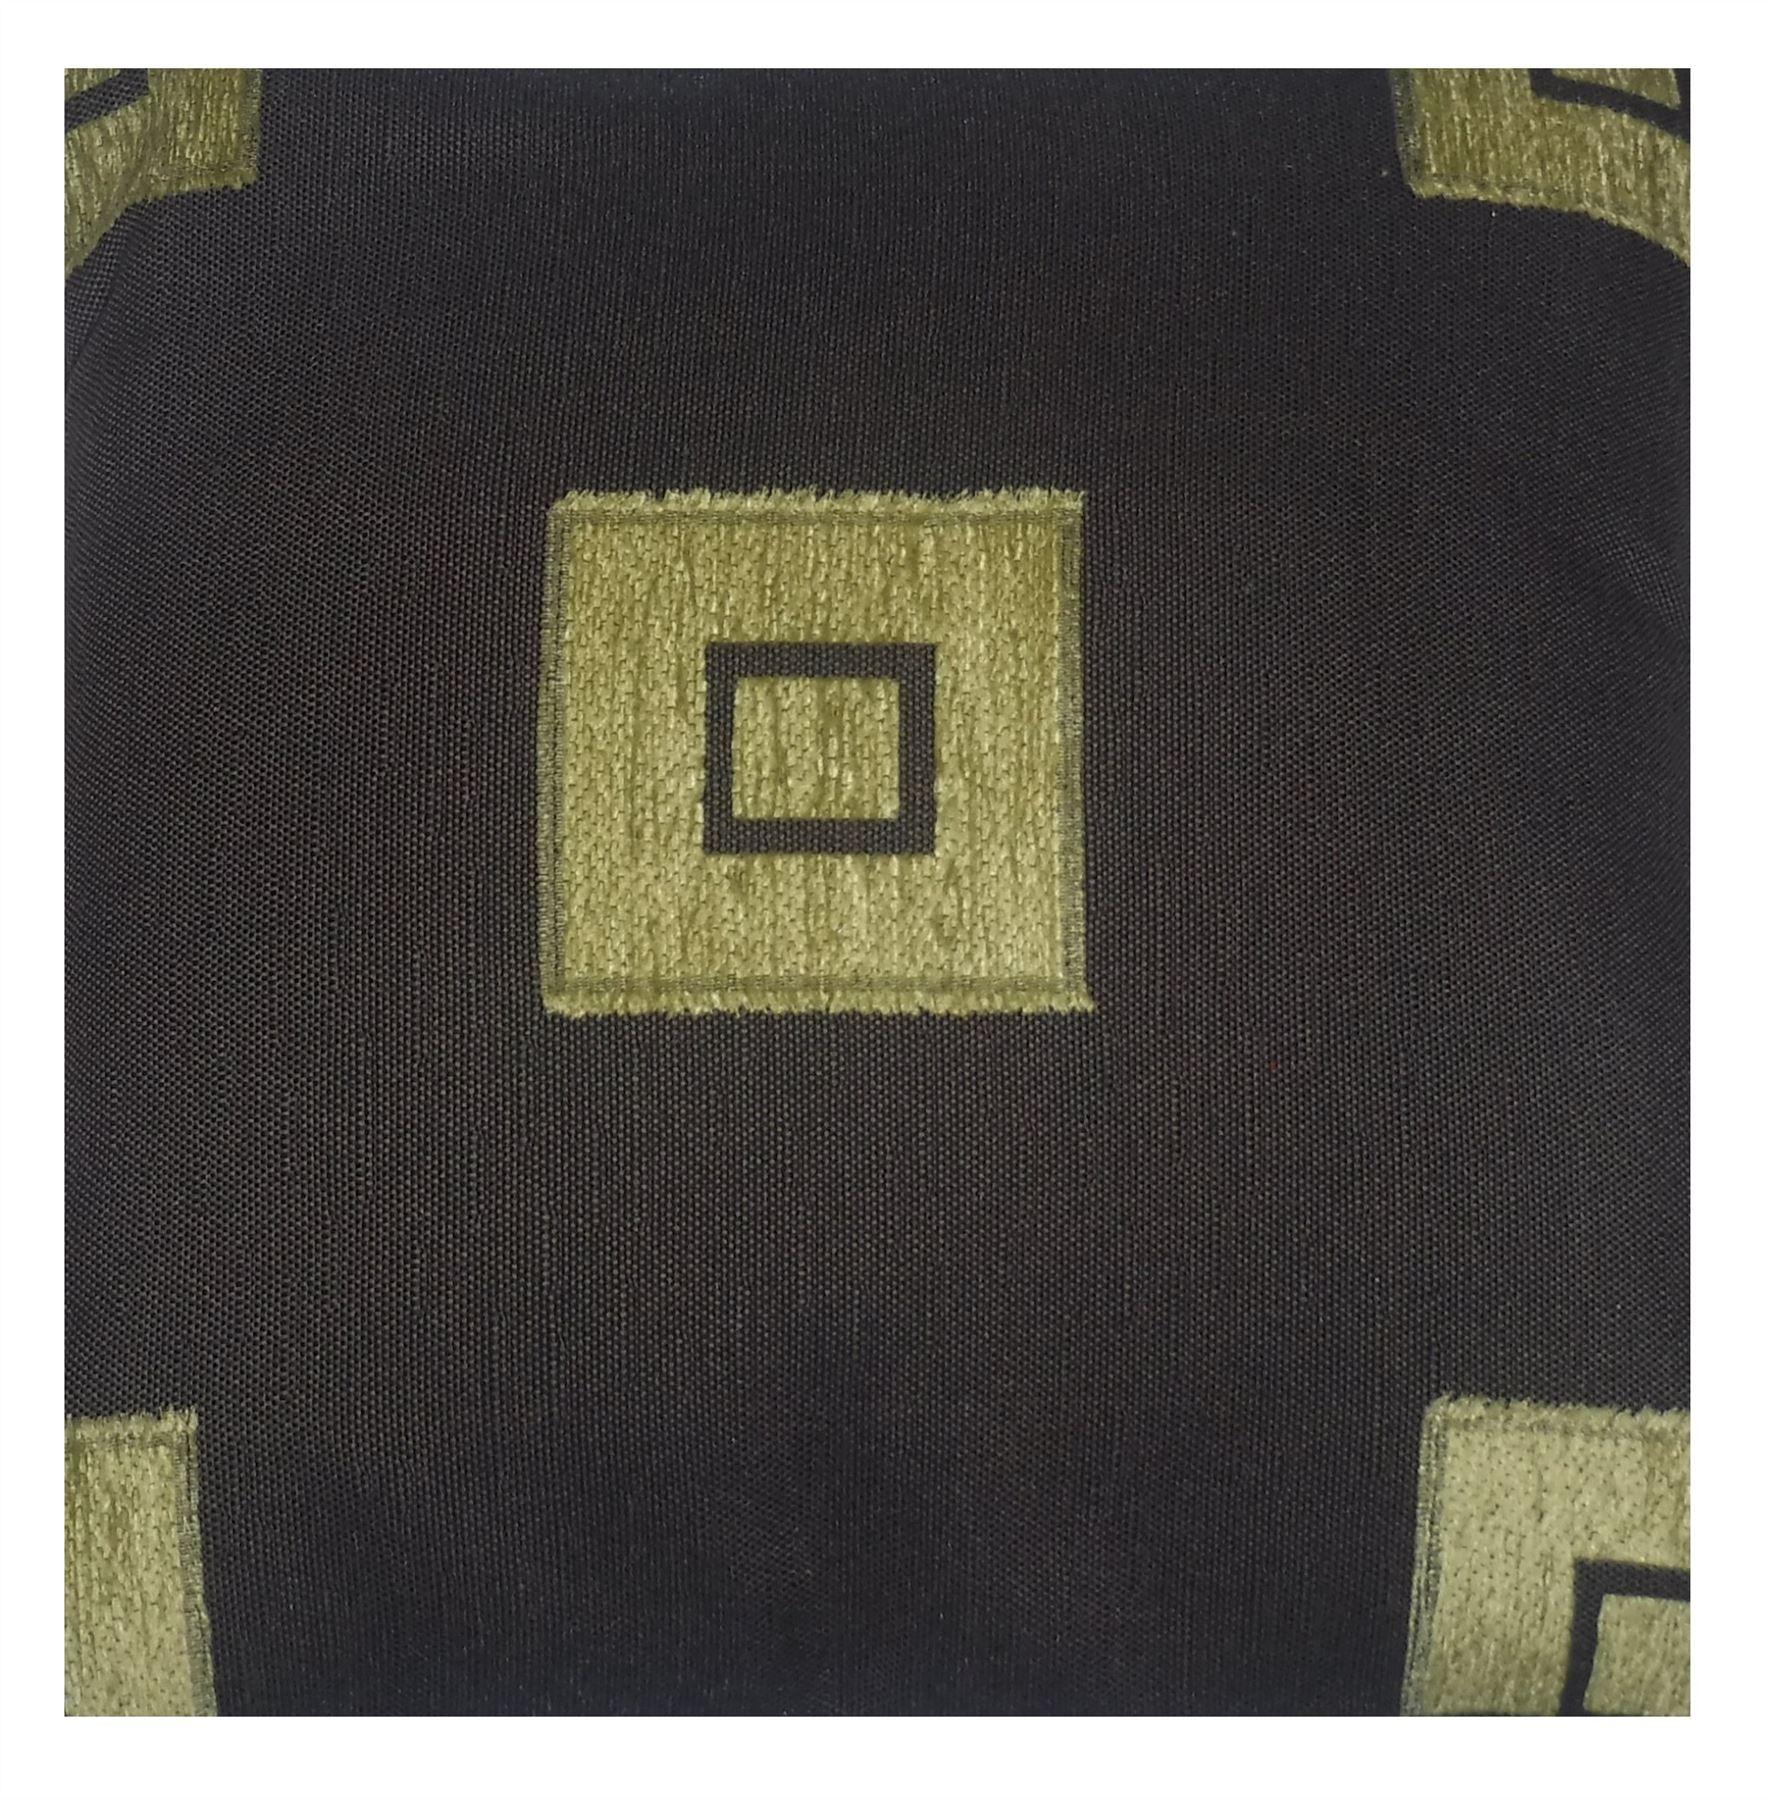 luxury rattan garden furniture replacement cushion covers With luxury garden furniture covers